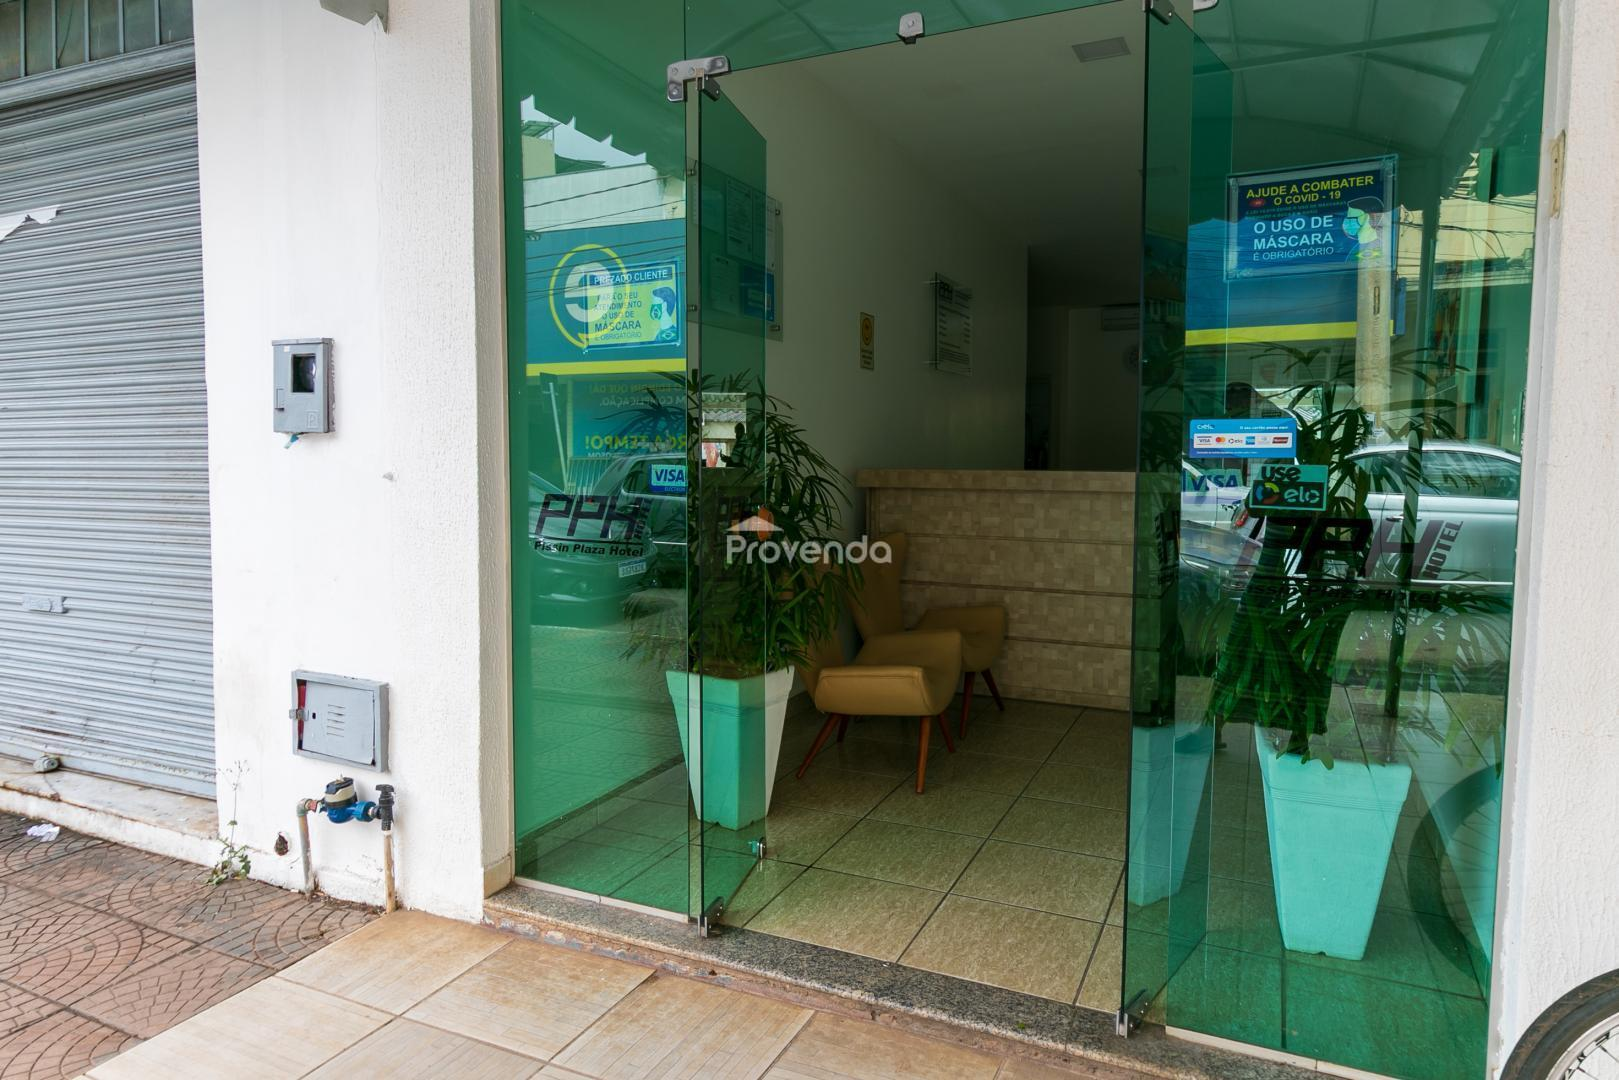 ARRENDAMENTO HOTEL SETOR CENTRAL